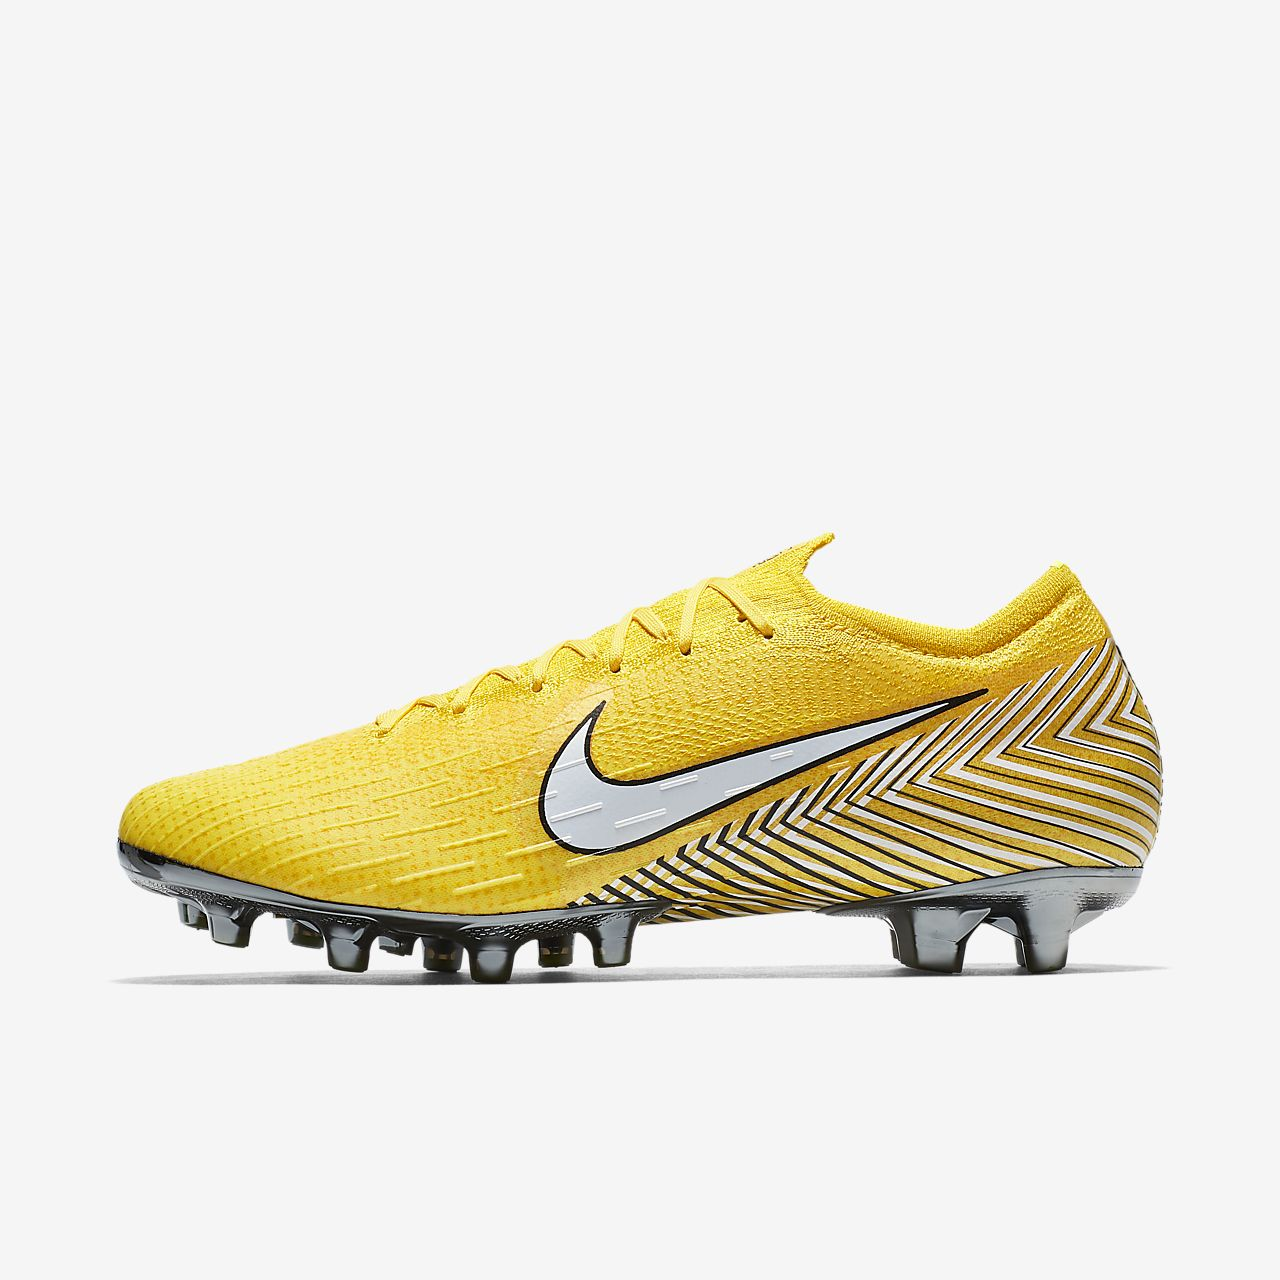 Scarpa da calcio per erba artificiale Nike Mercurial Vapor 360 Elite Neymar  Jr AG,PRO